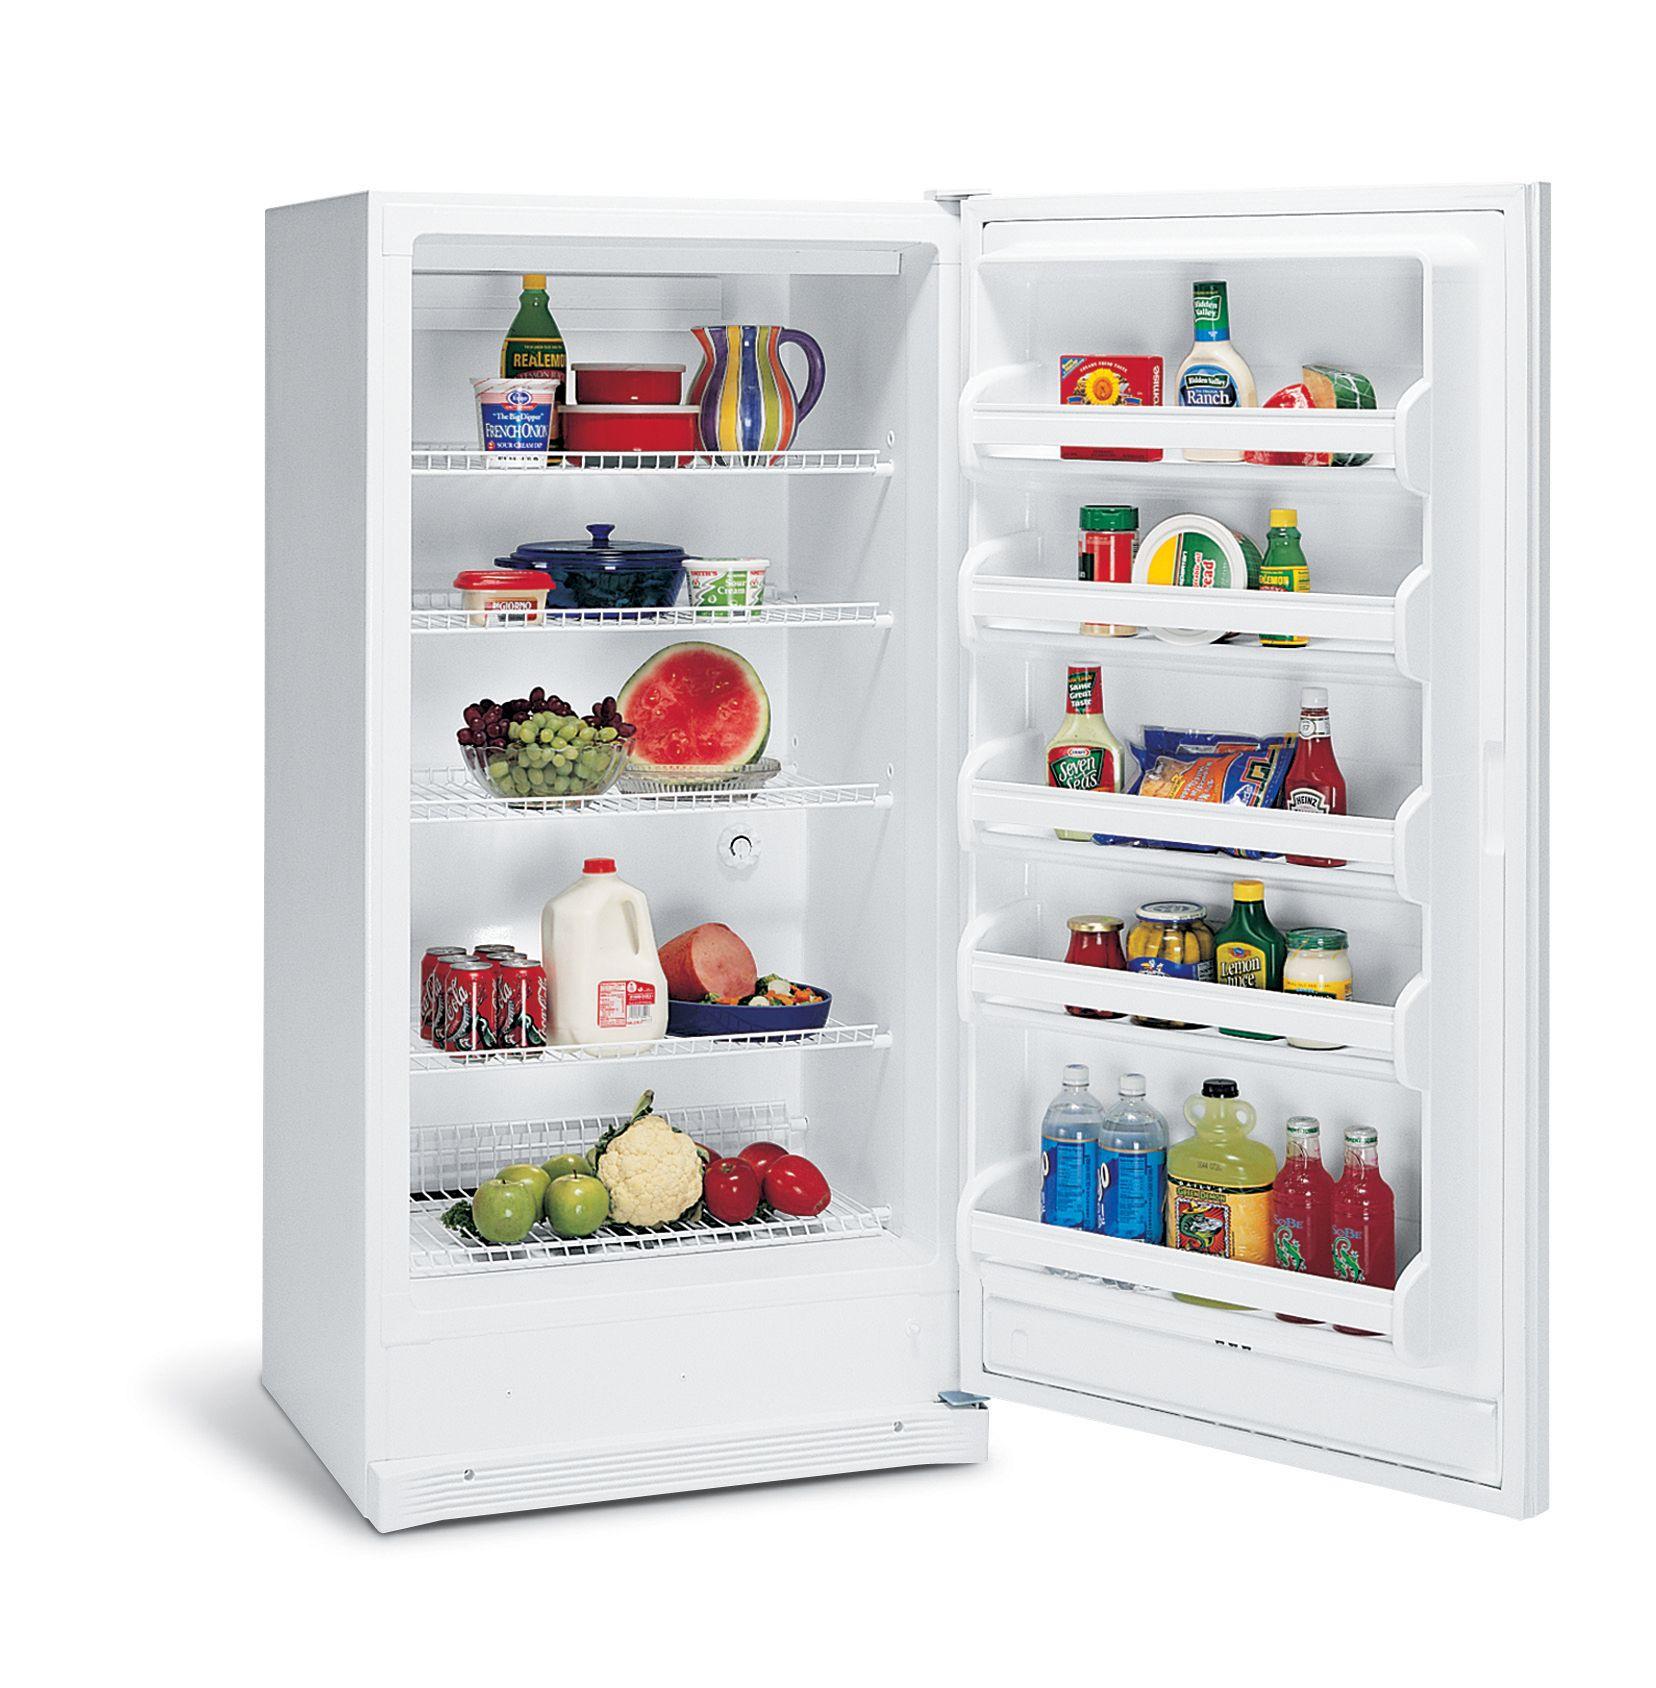 Frigidaire 16.7 cu. ft. Freezerless Refrigerator